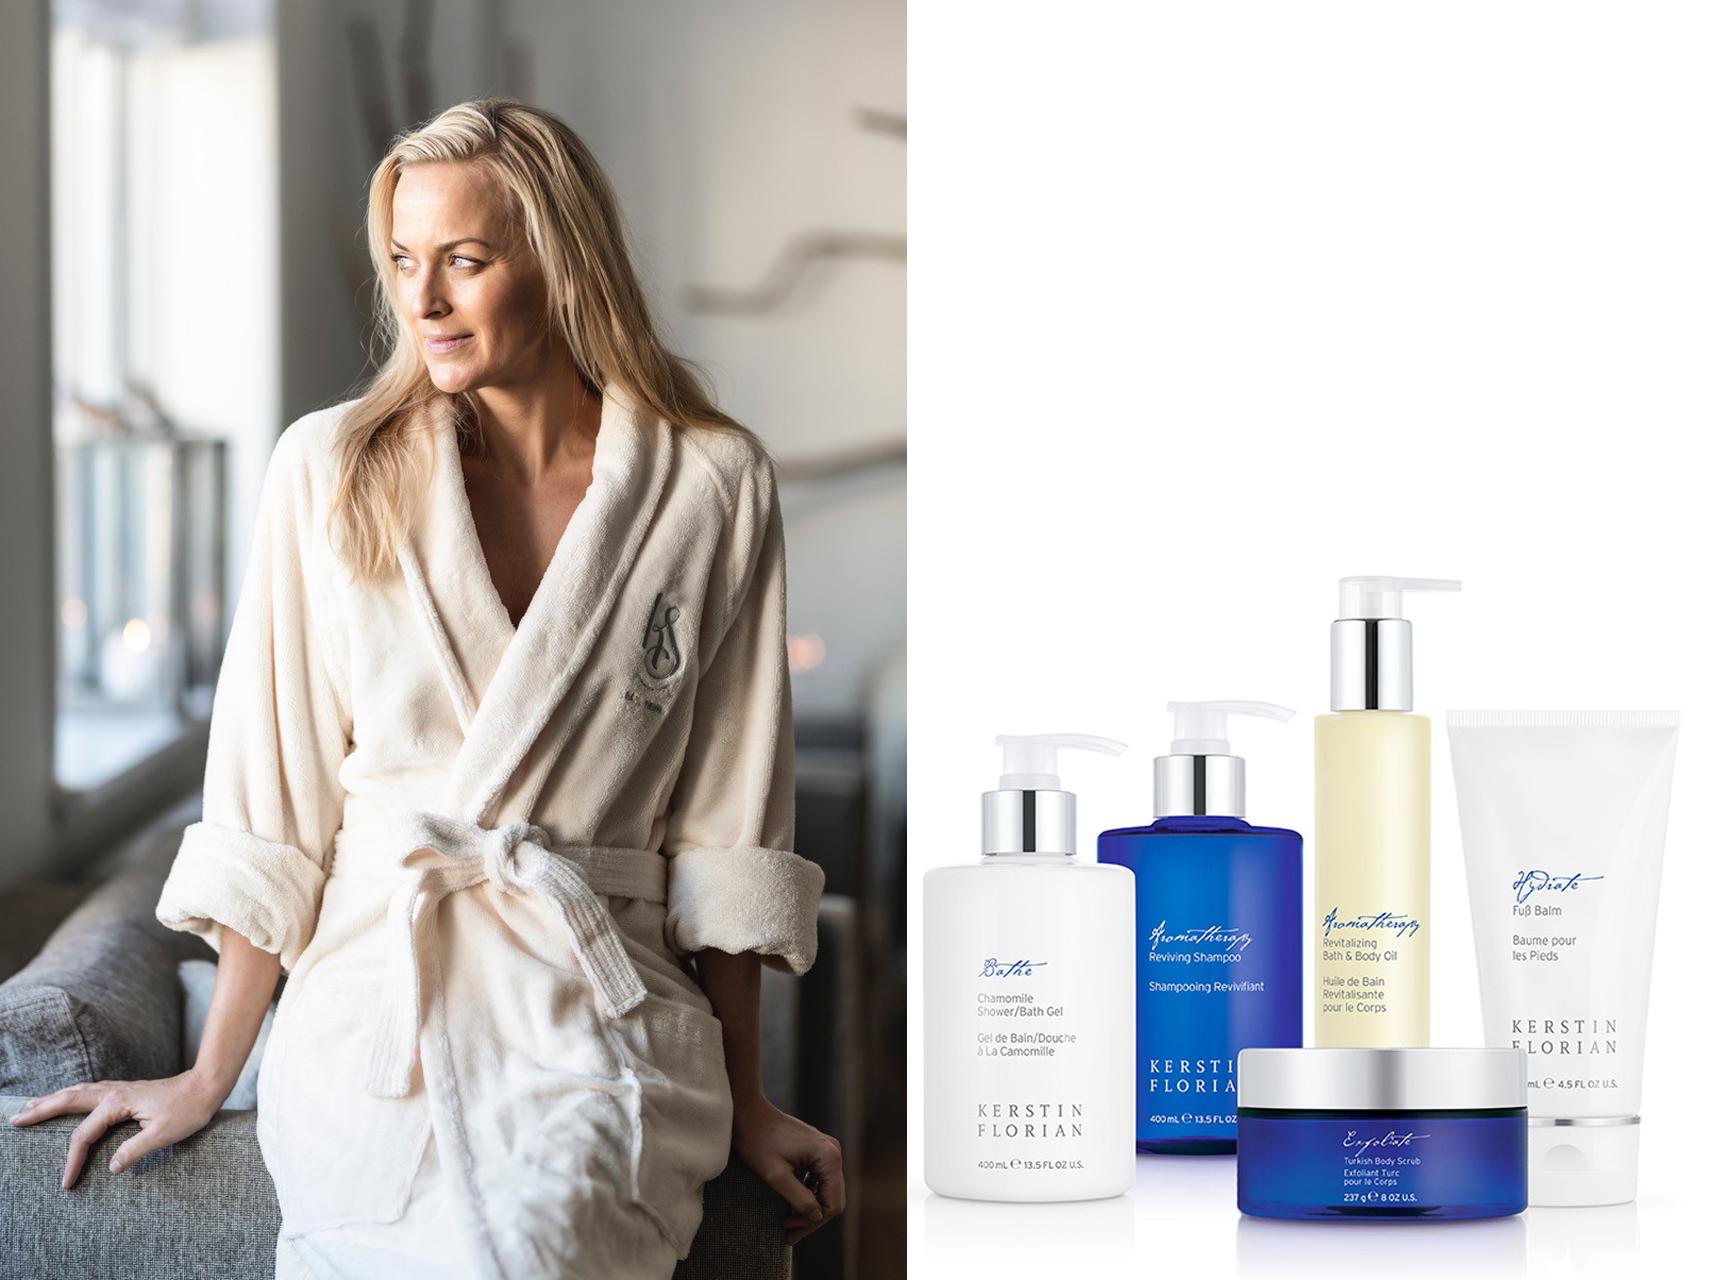 Camilla i badekåbe & Kerstin florian produkter Beauty Salon 04.04.19.jpg